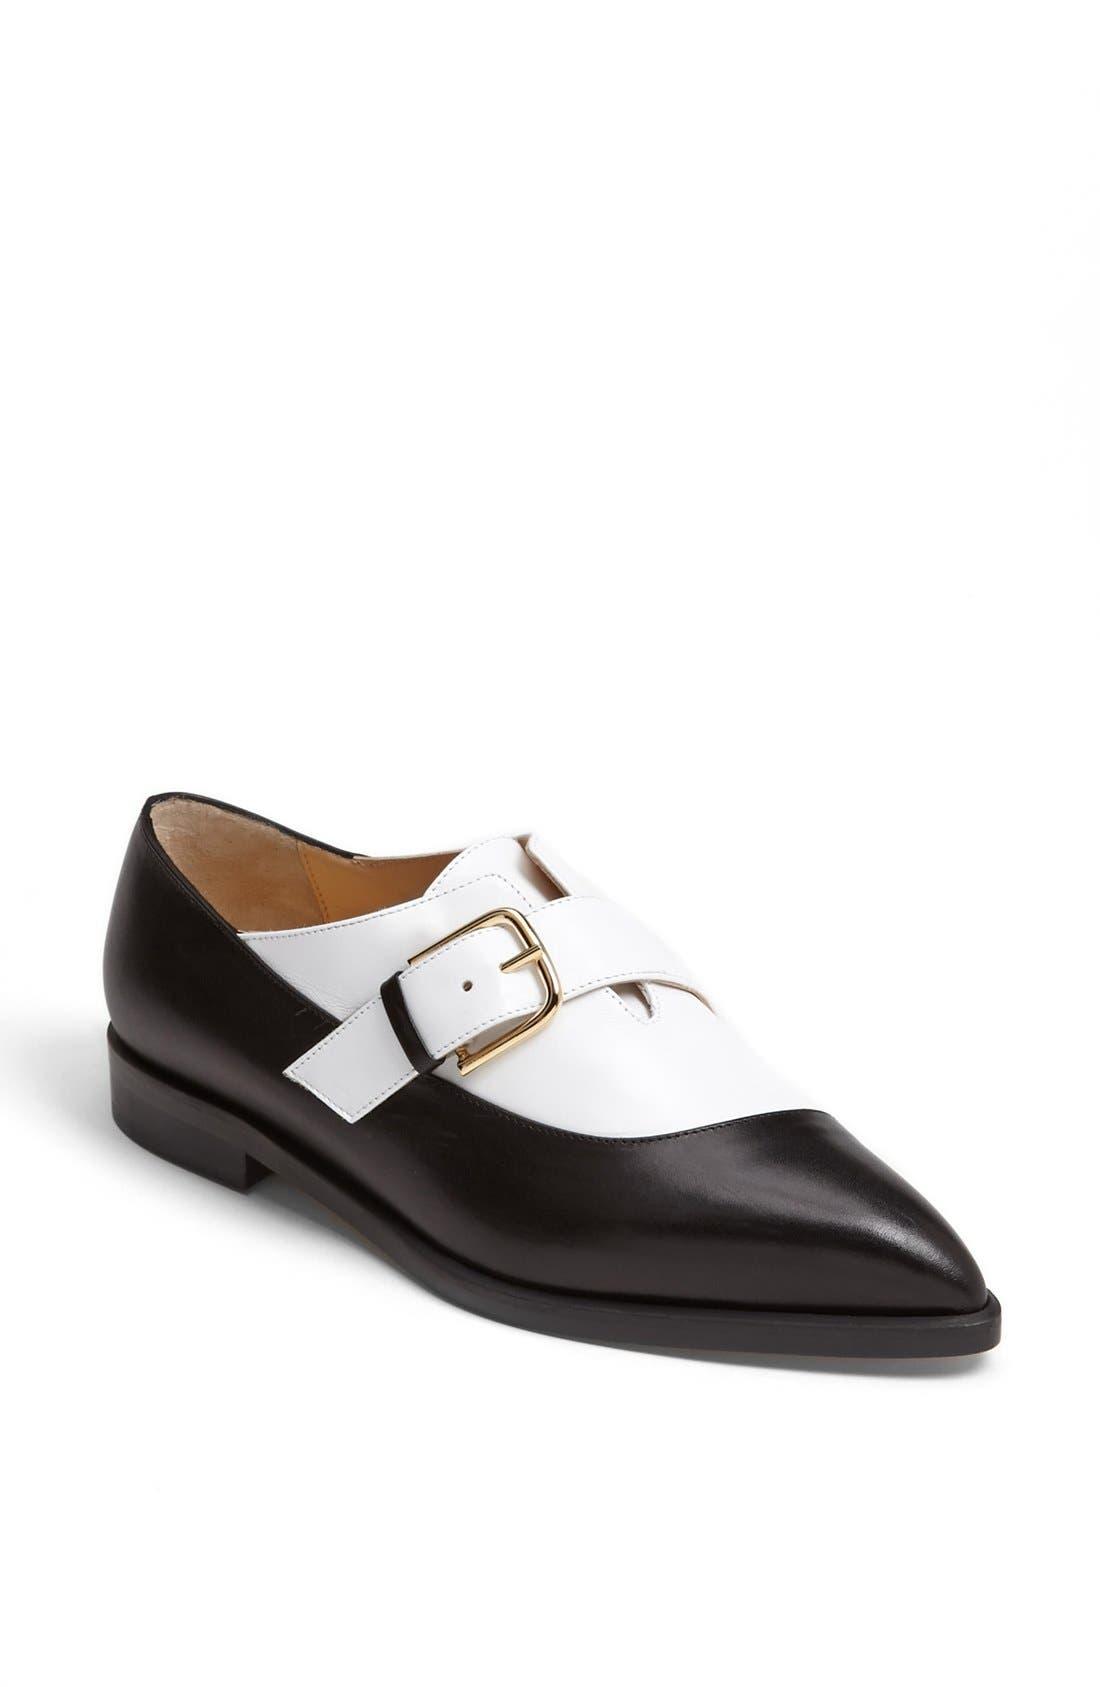 Main Image - Bionda Castana 'Norma' Brogue Shoe